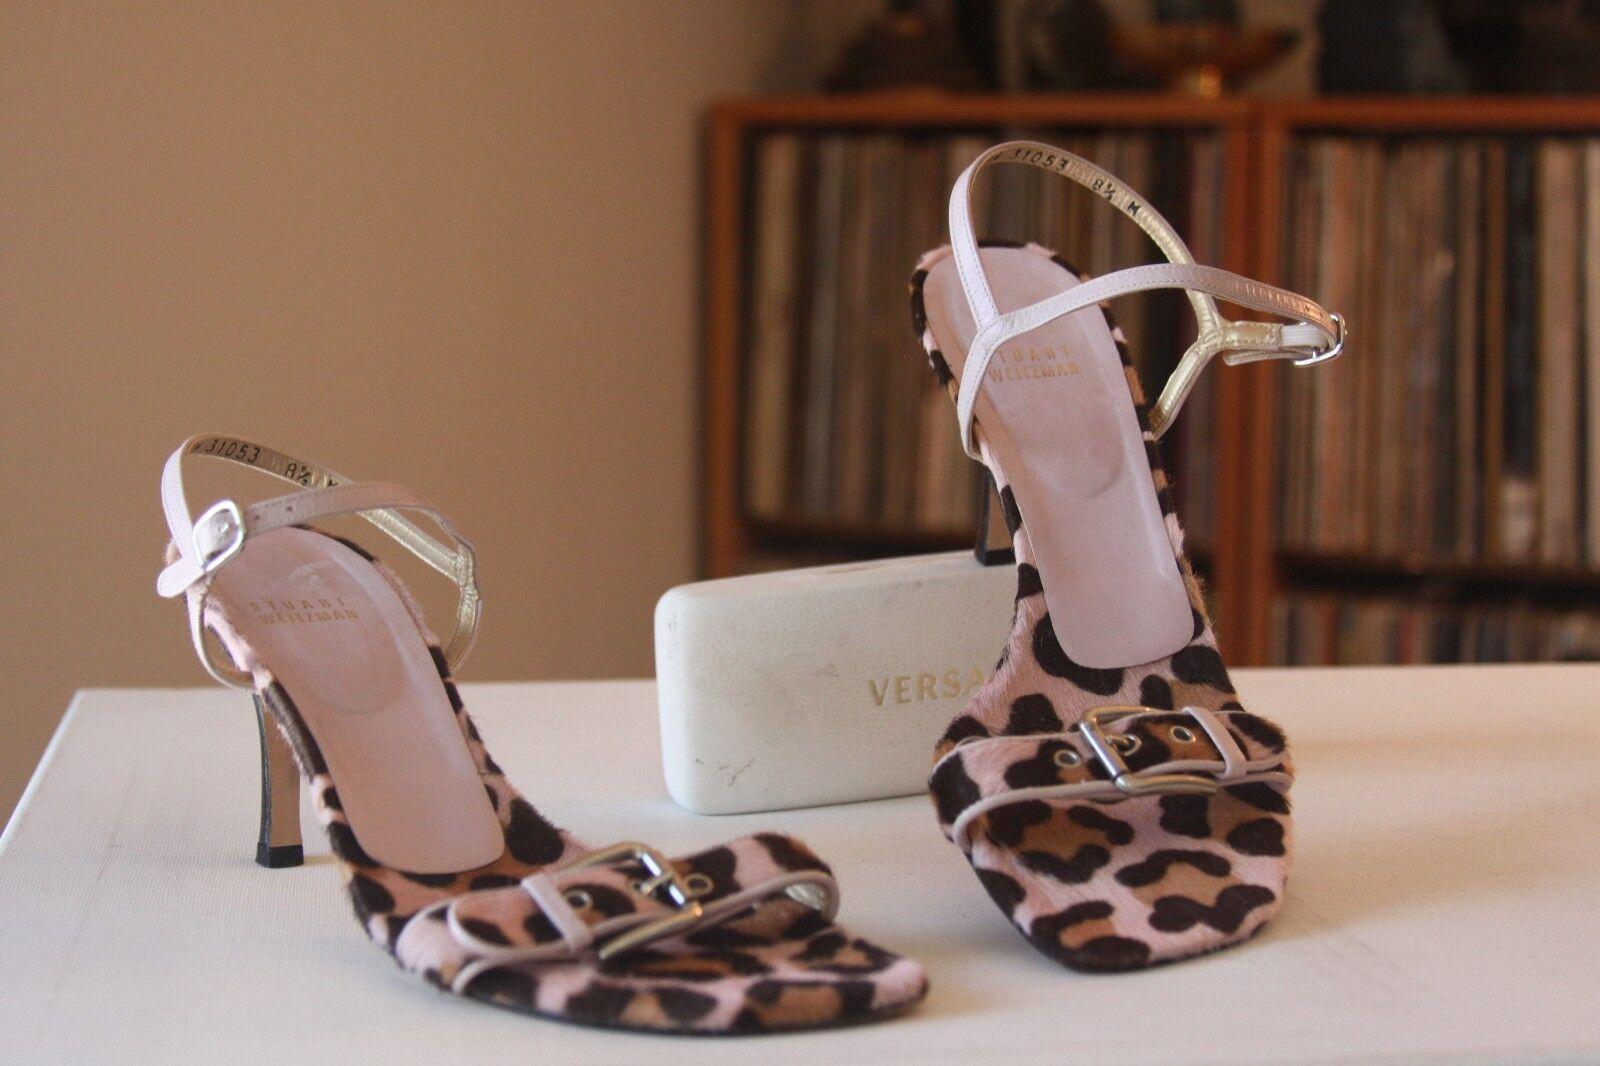 Stuart Weitzman 31053 Leopard Calf Hair 3 Inch Heel Ankle Strap Sandals Sz 8.5 M